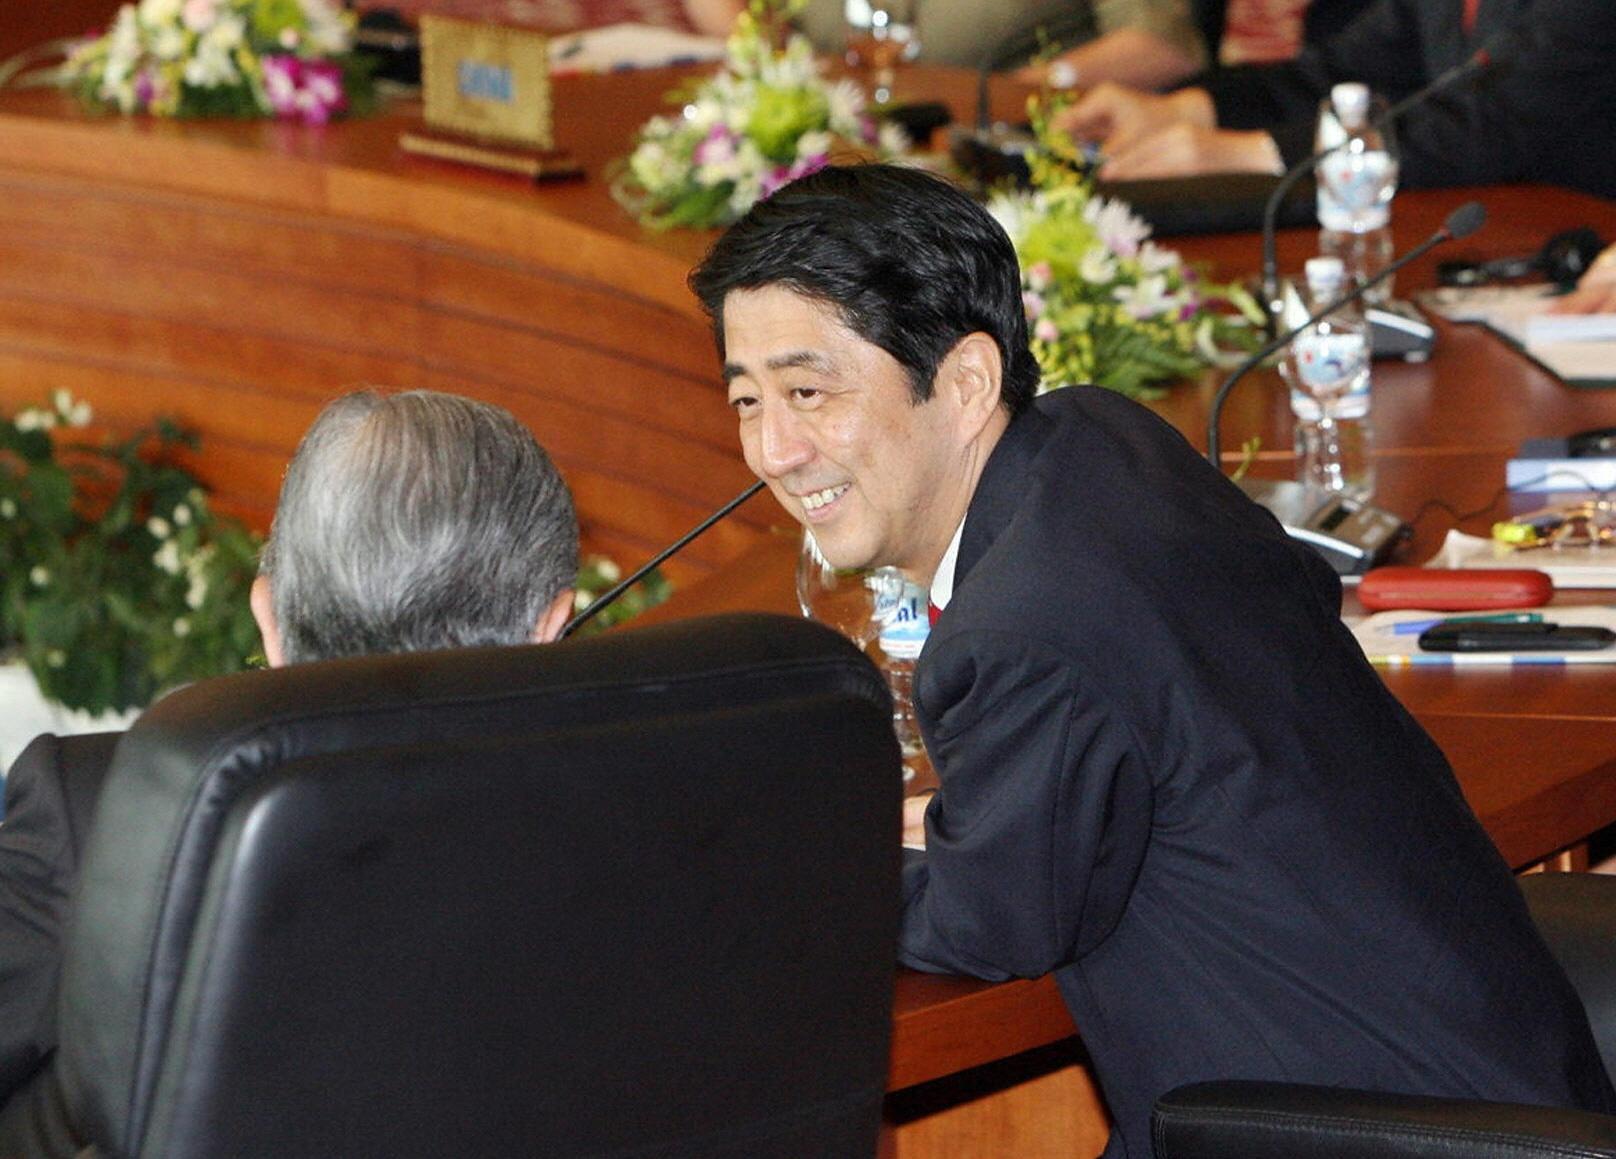 APEC 2006: Xu ly khong kheo, mot la phieu bo di la minh cung kho khan hinh anh 8